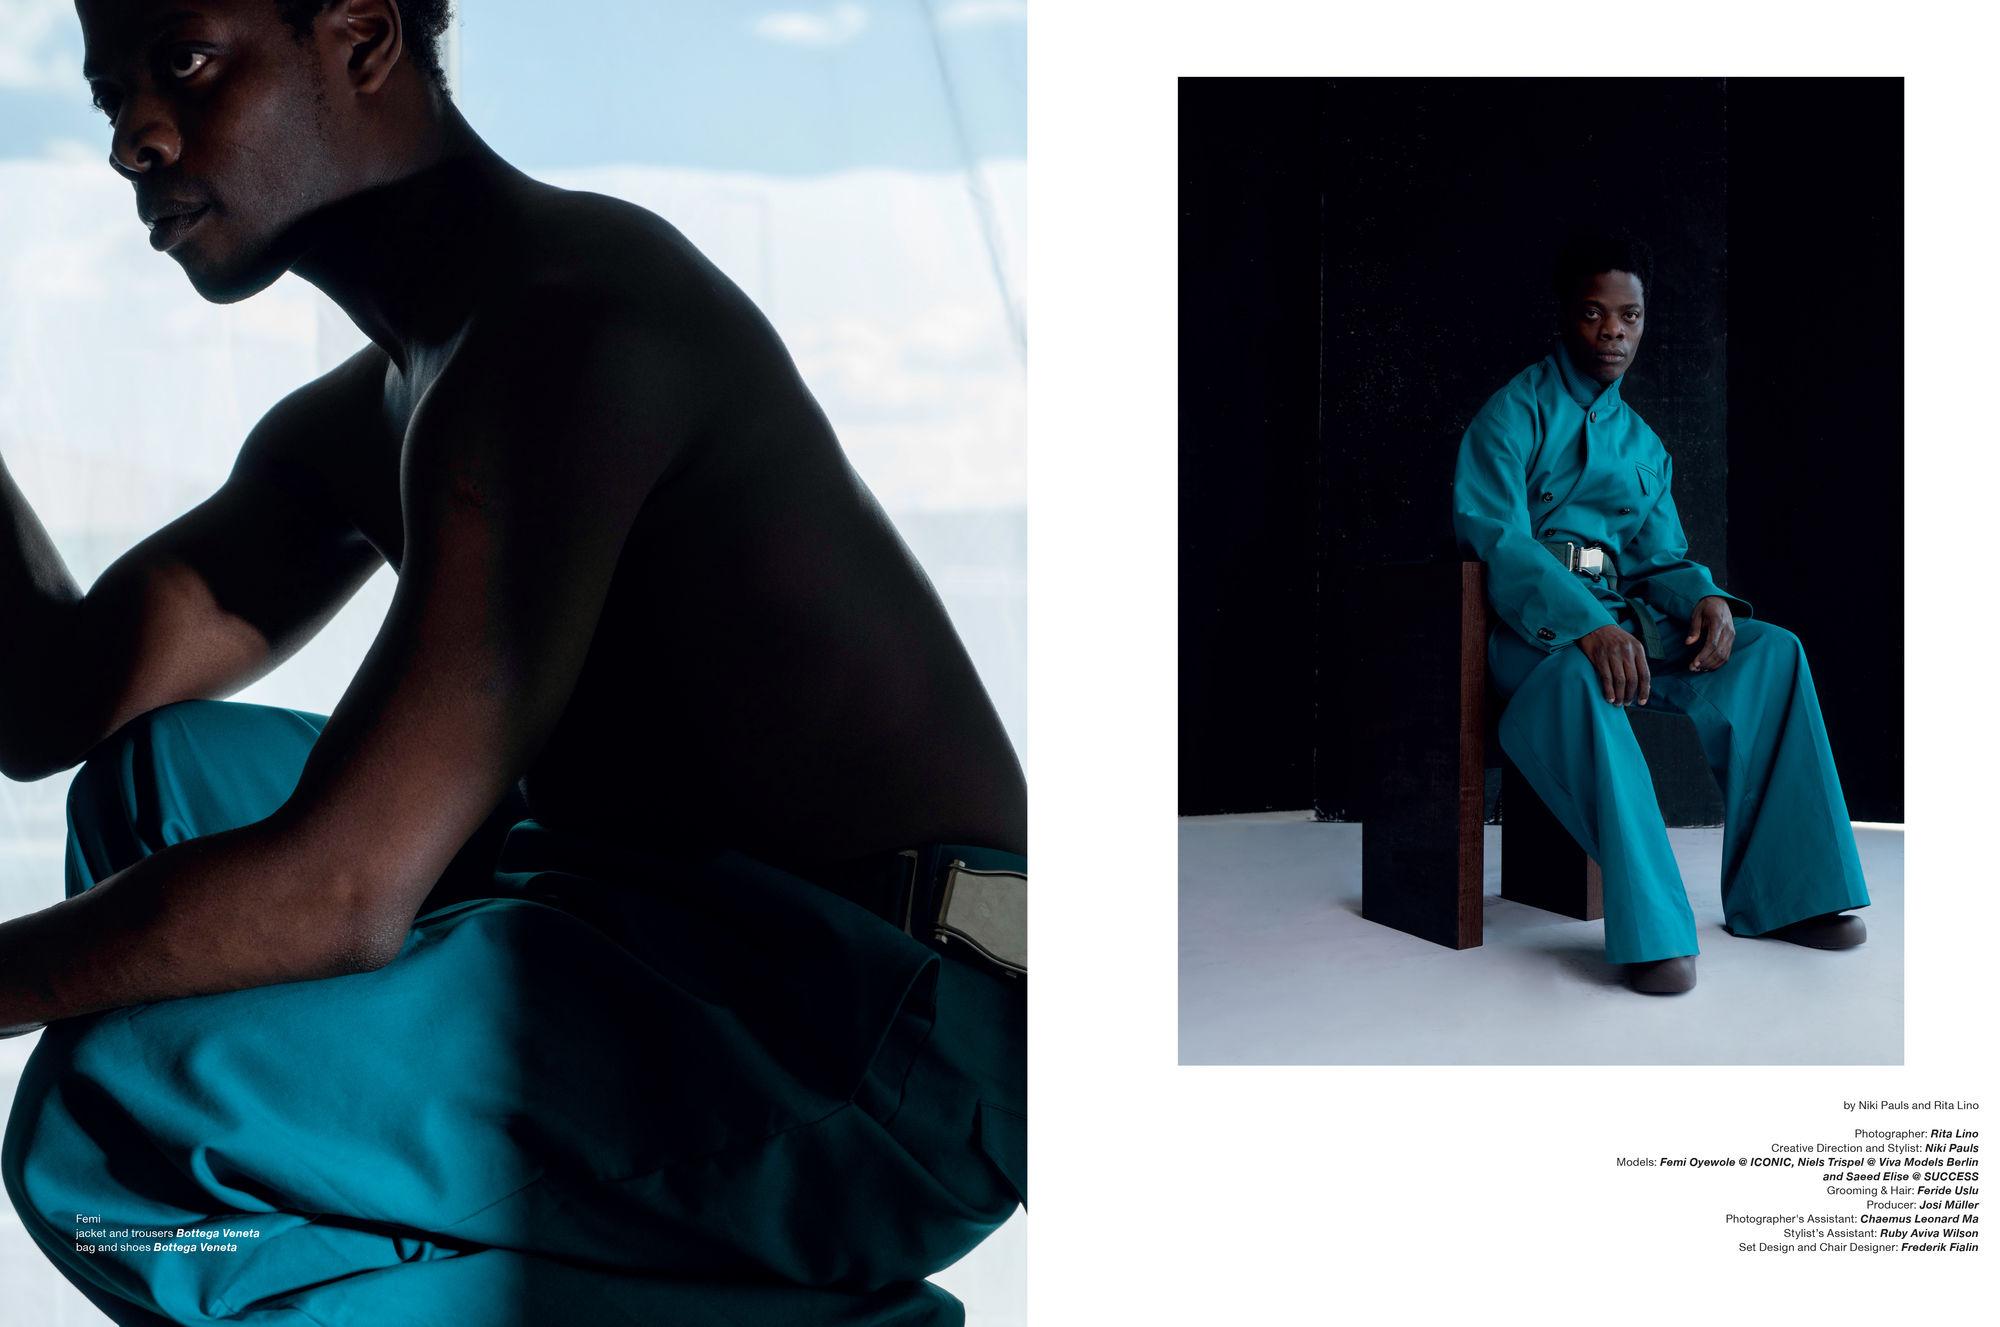 Berlin Based Femi Oyewole for ZOO Magazine No.70 Cover Story ICONIC